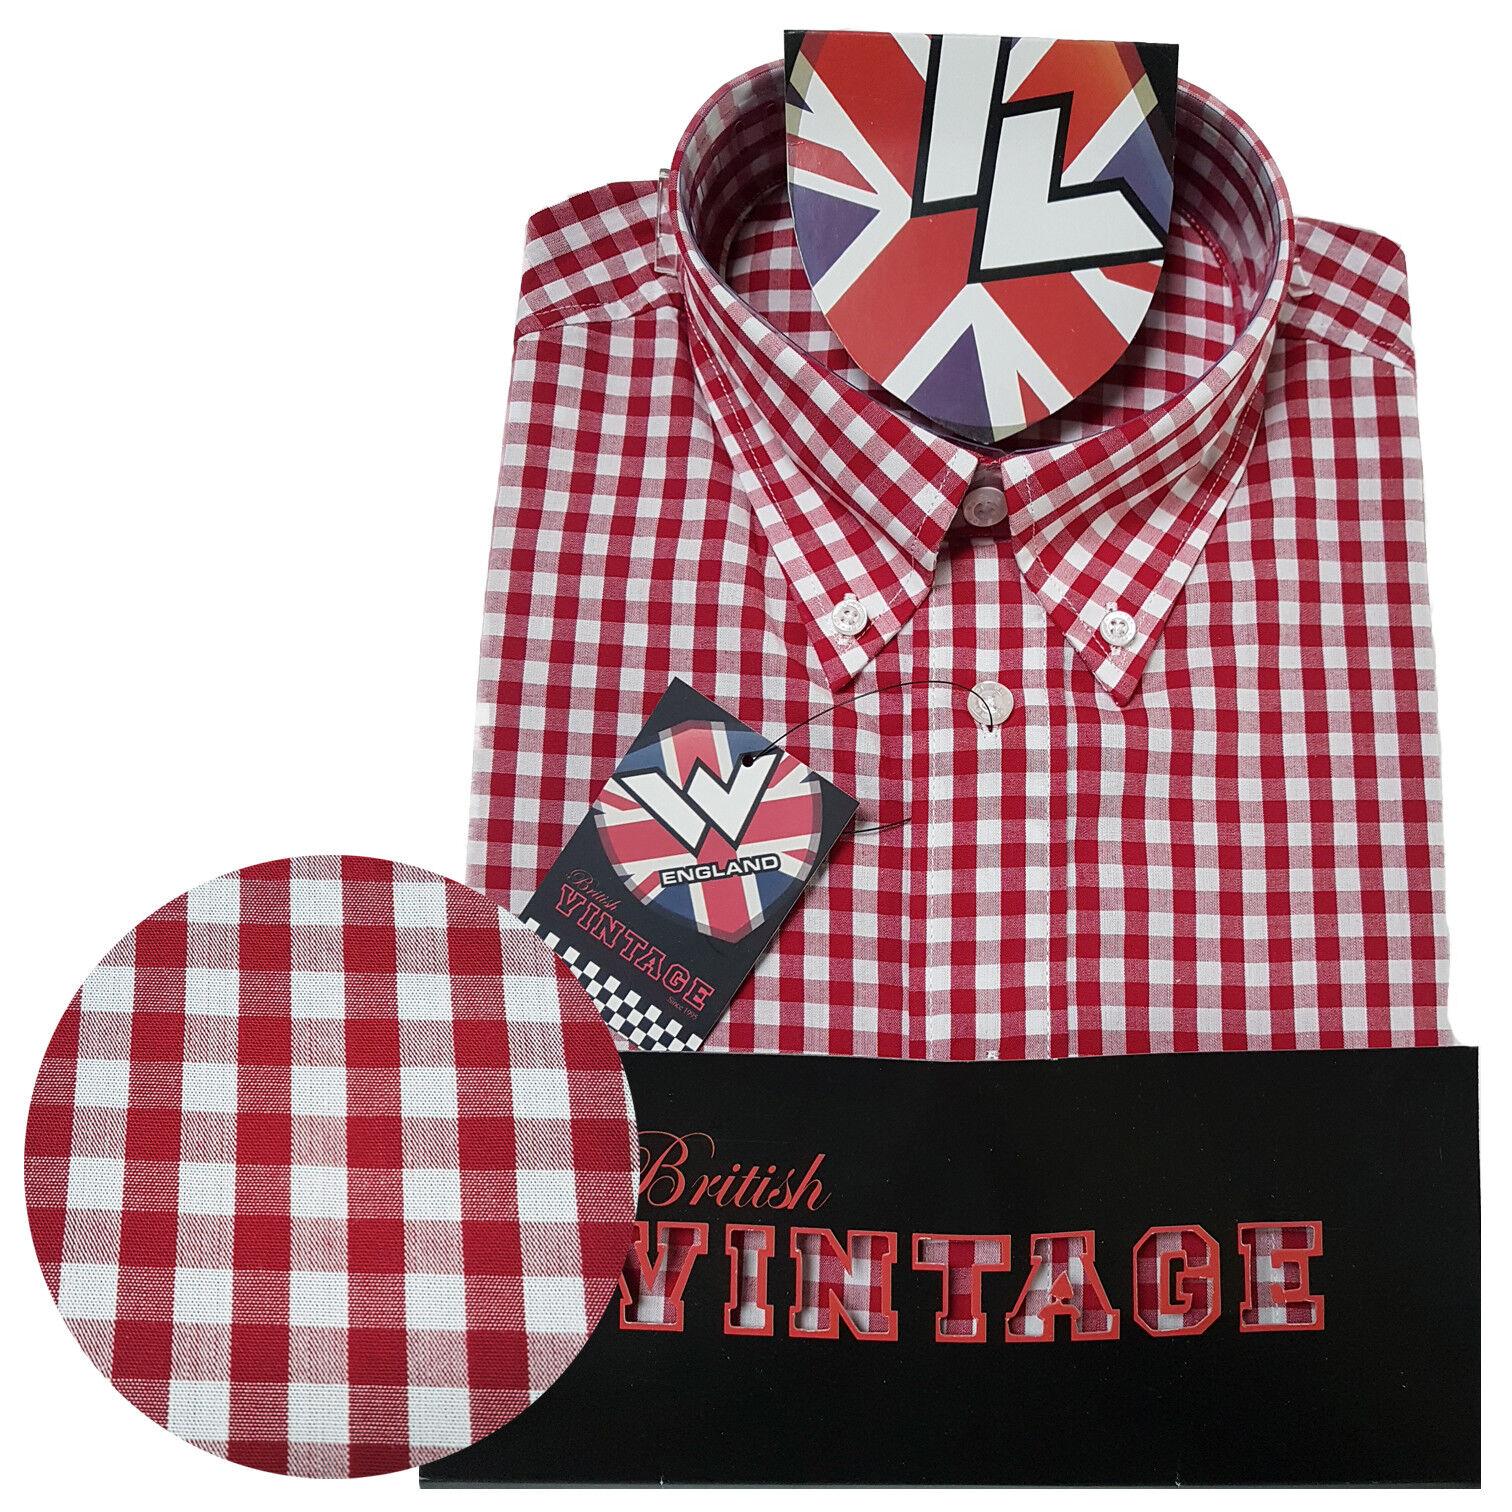 Warrior UK England Button Down Shirt GOVER Hemd Slim-Fit Skinhead Mod     Moderner Modus    Vogue    Up-to-date Styling